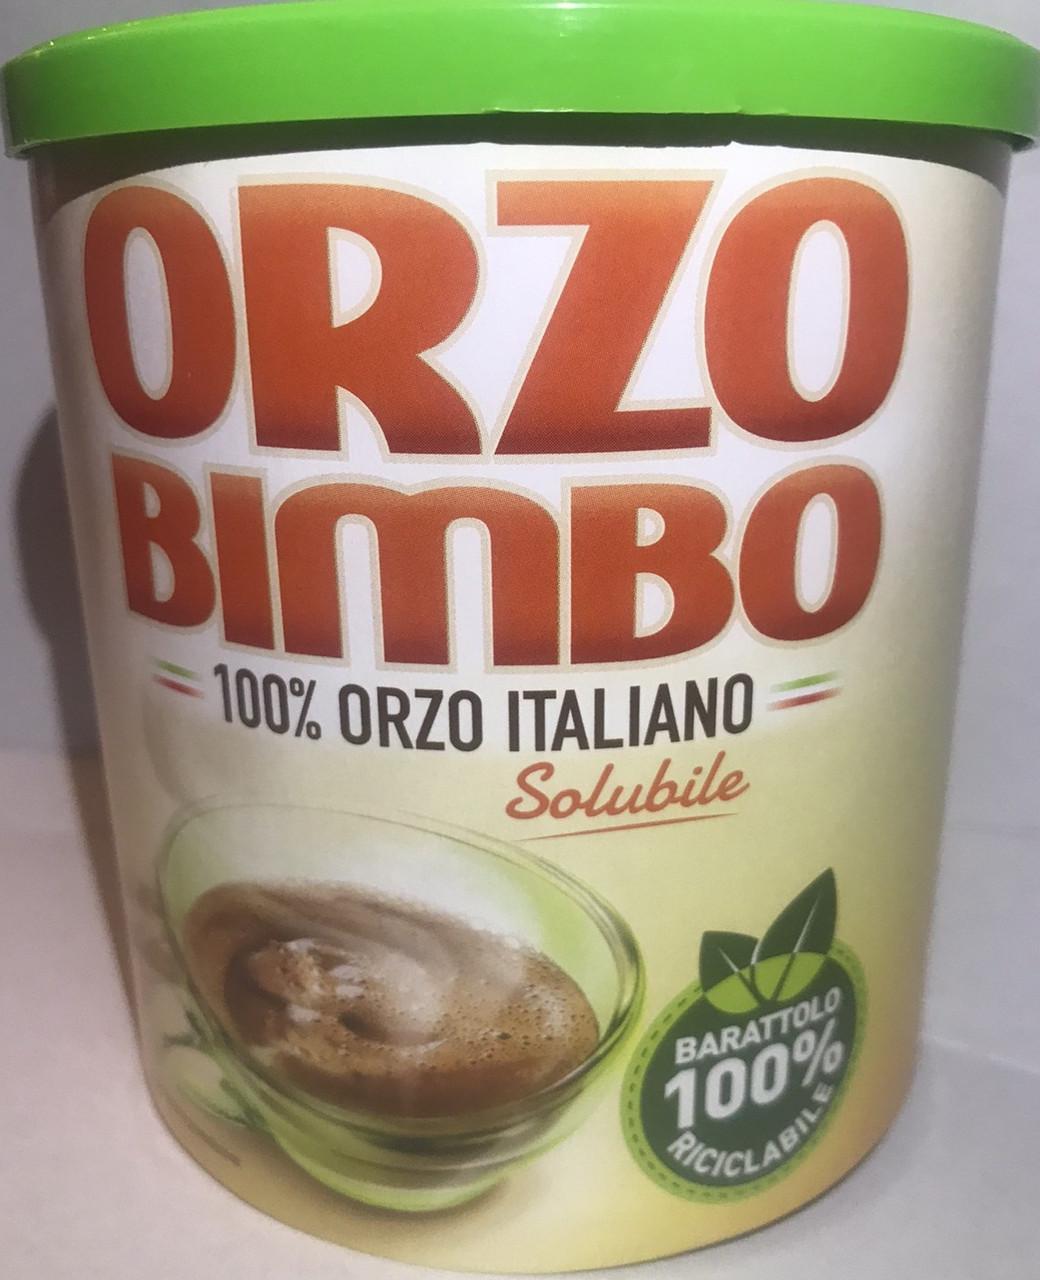 Ячменный кофе Orzo Bimbo 120гр Италия